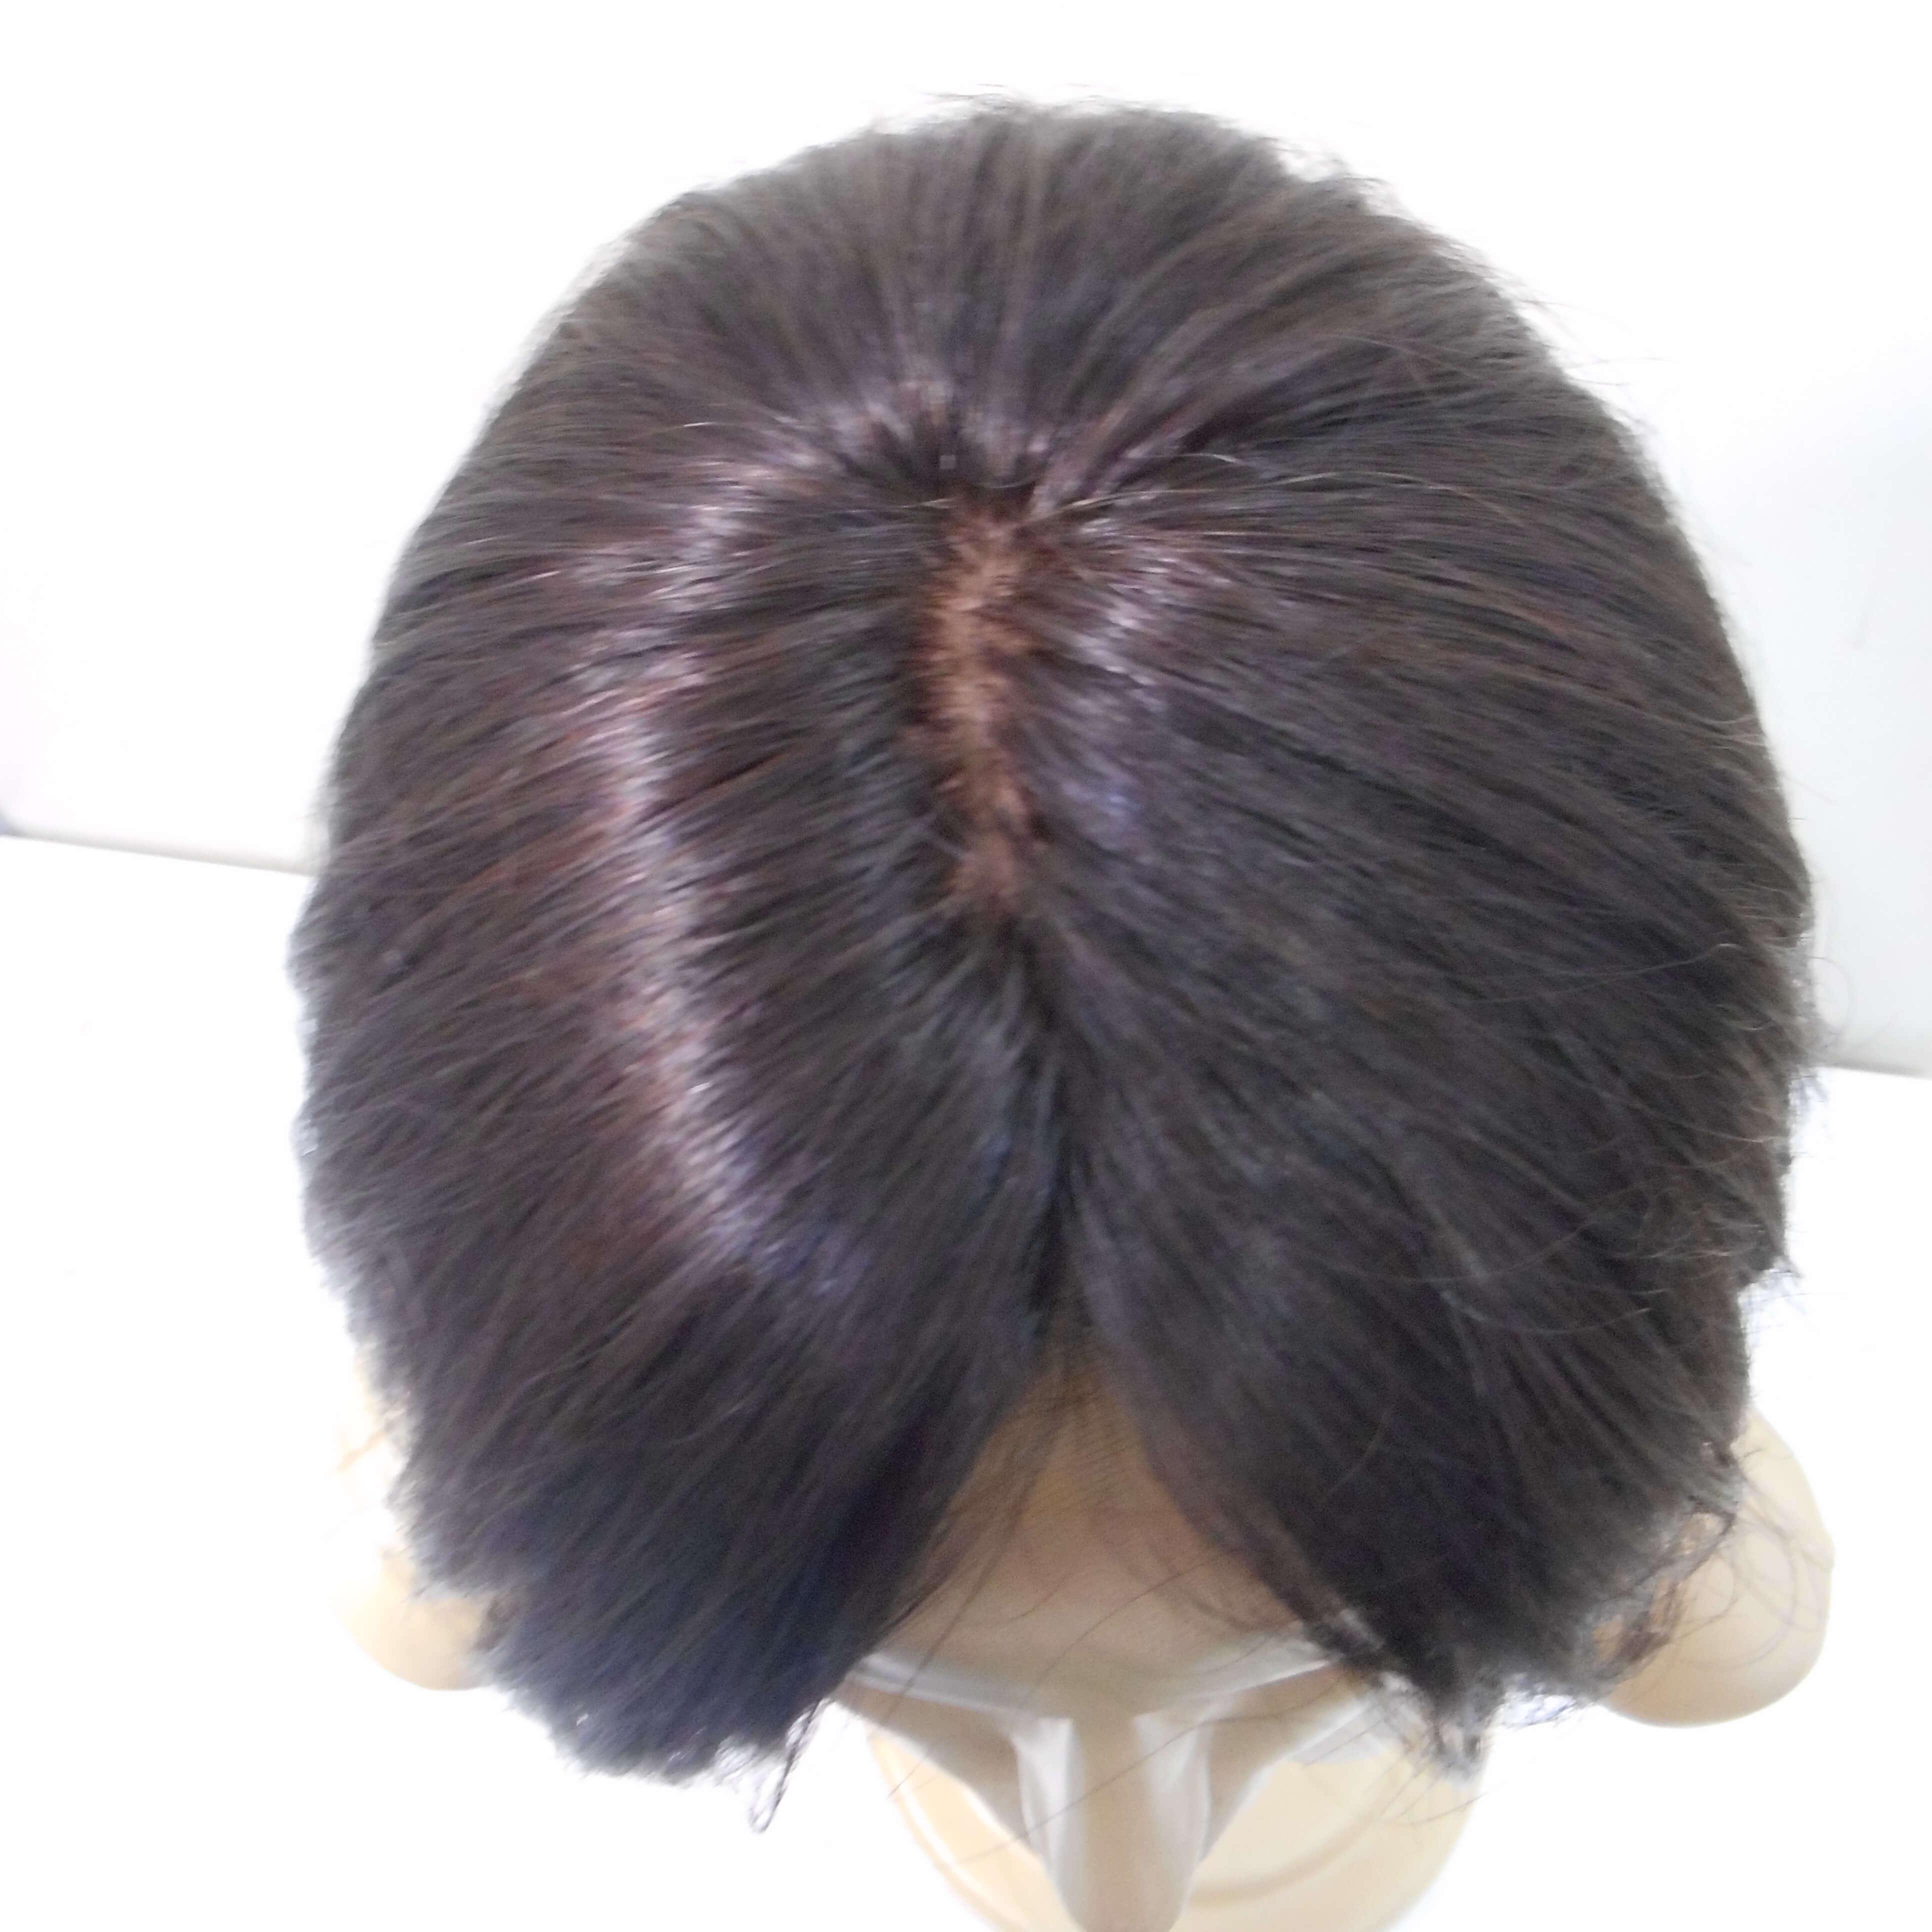 Peruca de cabelo natural castanho médio FULL LACE